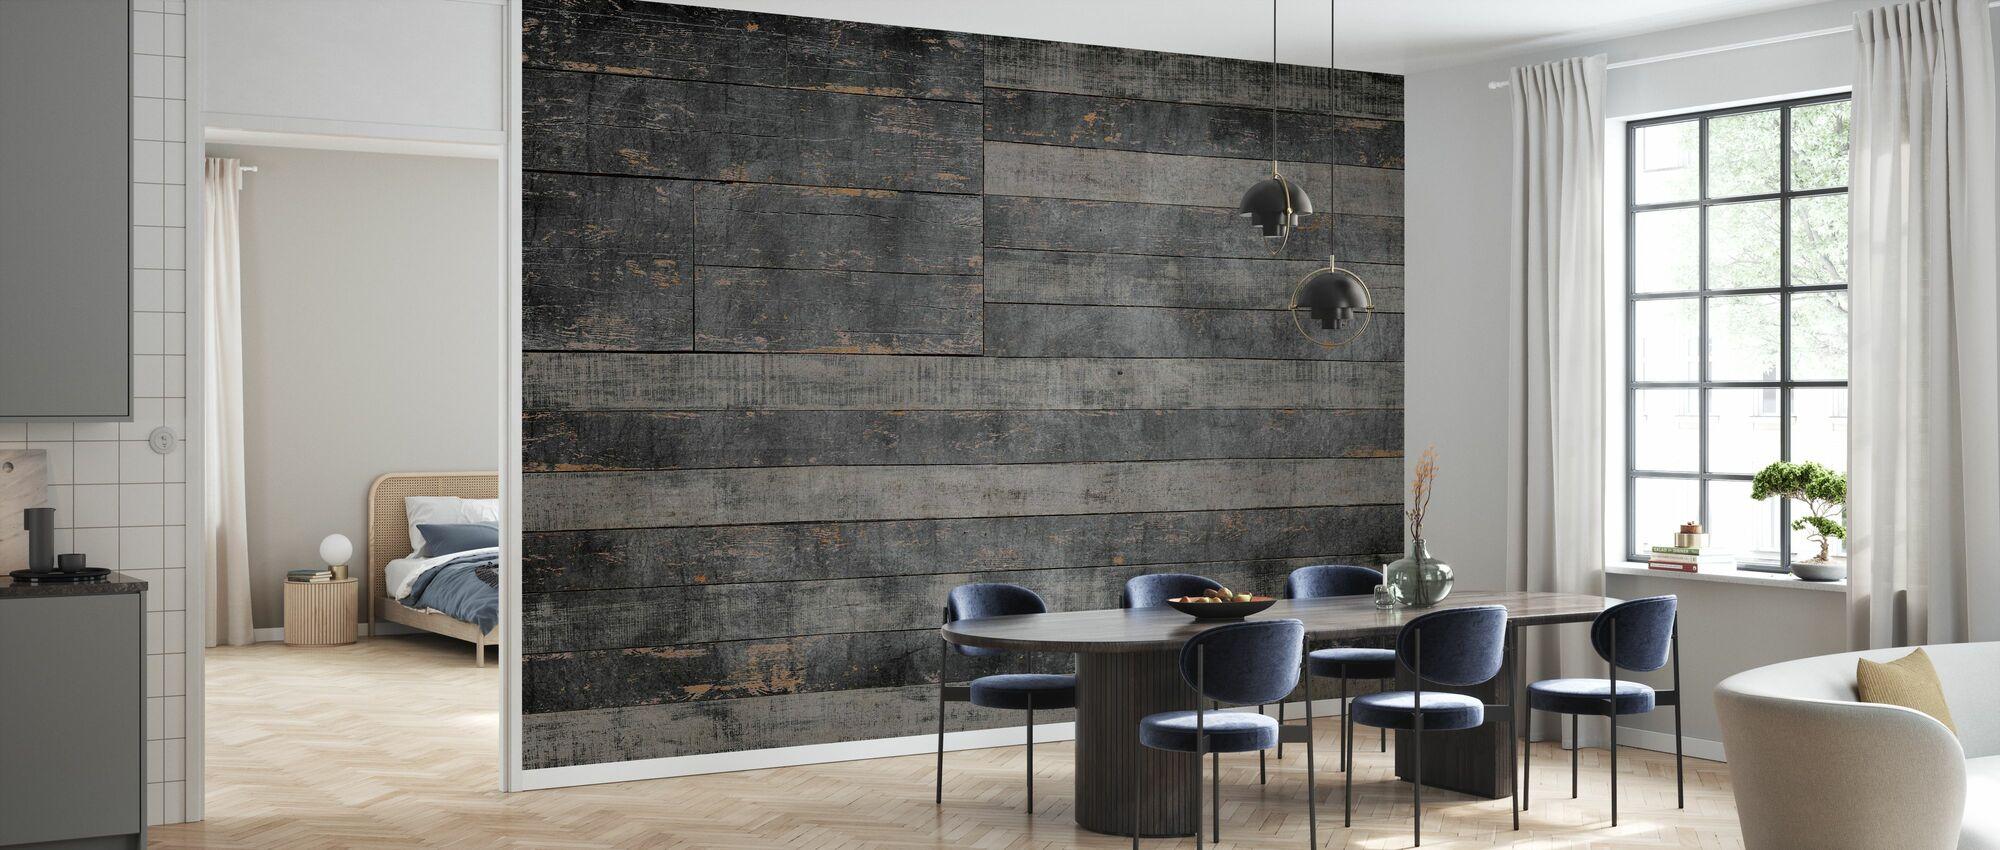 Stars and Stripes in Black - Wallpaper - Kitchen